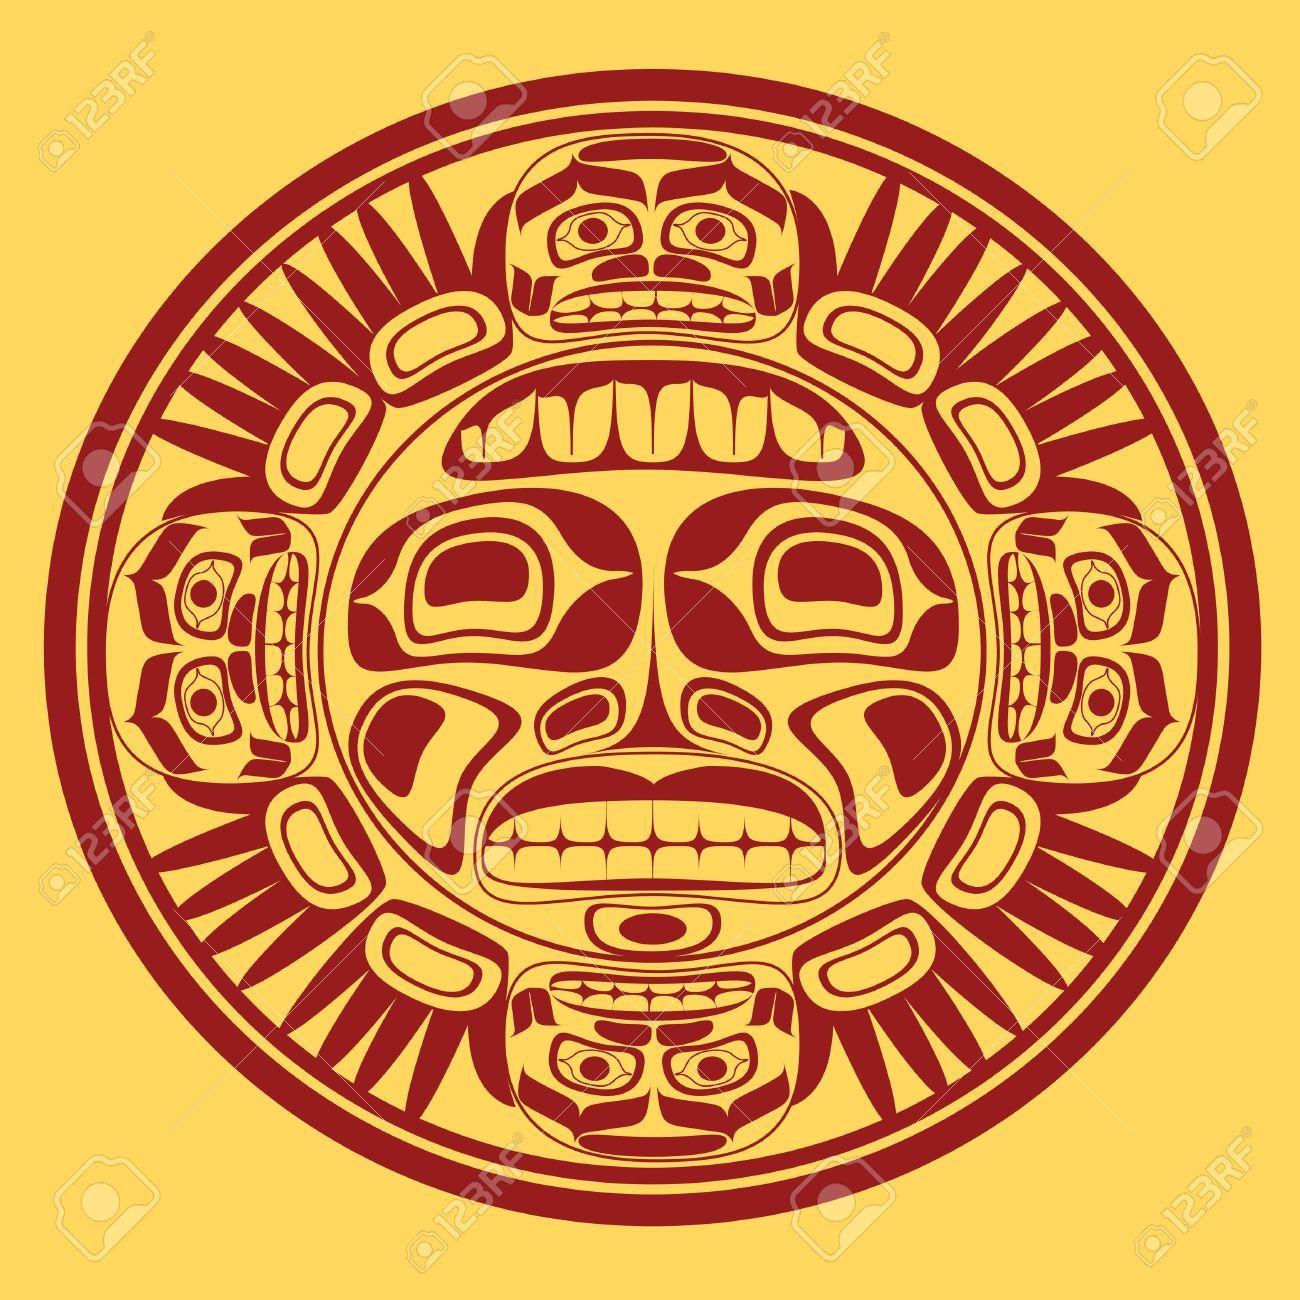 nw native sun symbol 16803704 sun symbol stylization of northwest art art native. Black Bedroom Furniture Sets. Home Design Ideas